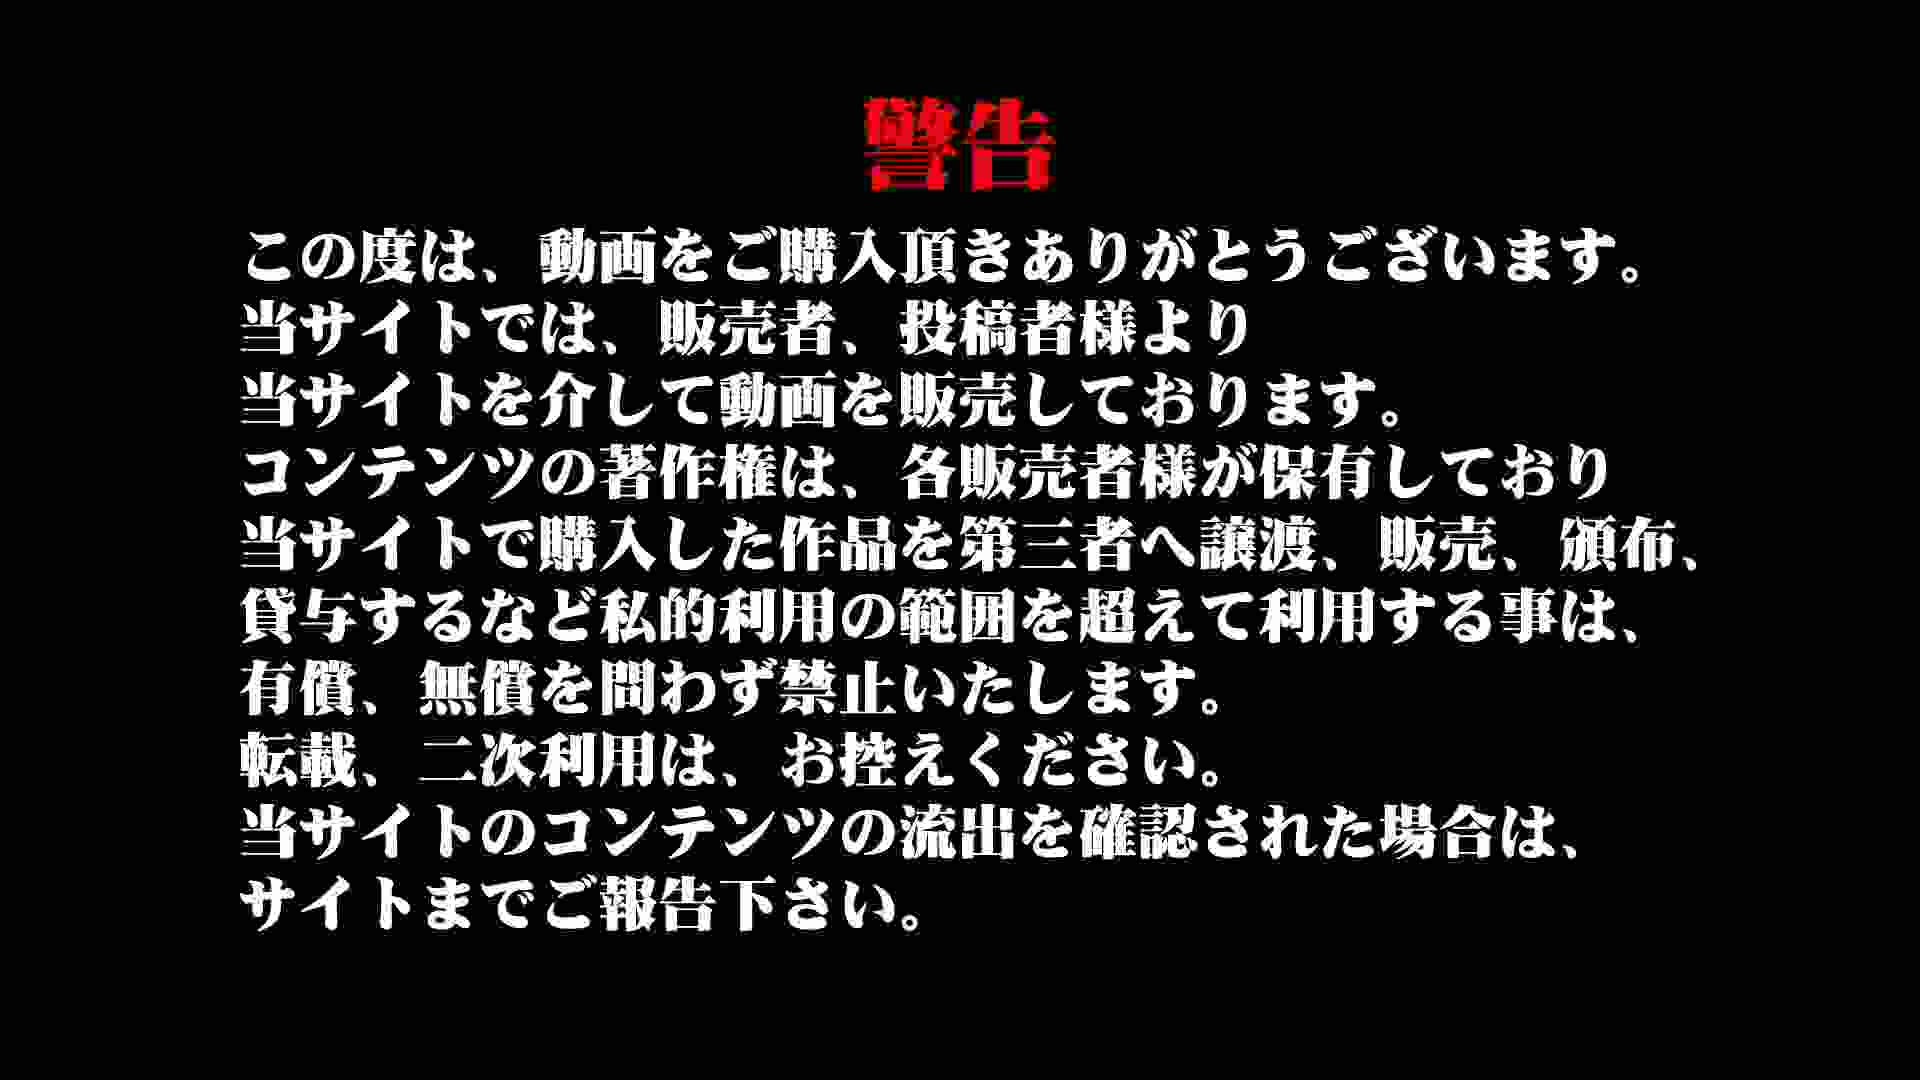 Aquaな露天風呂Vol.902 盗撮師作品  104pic 3